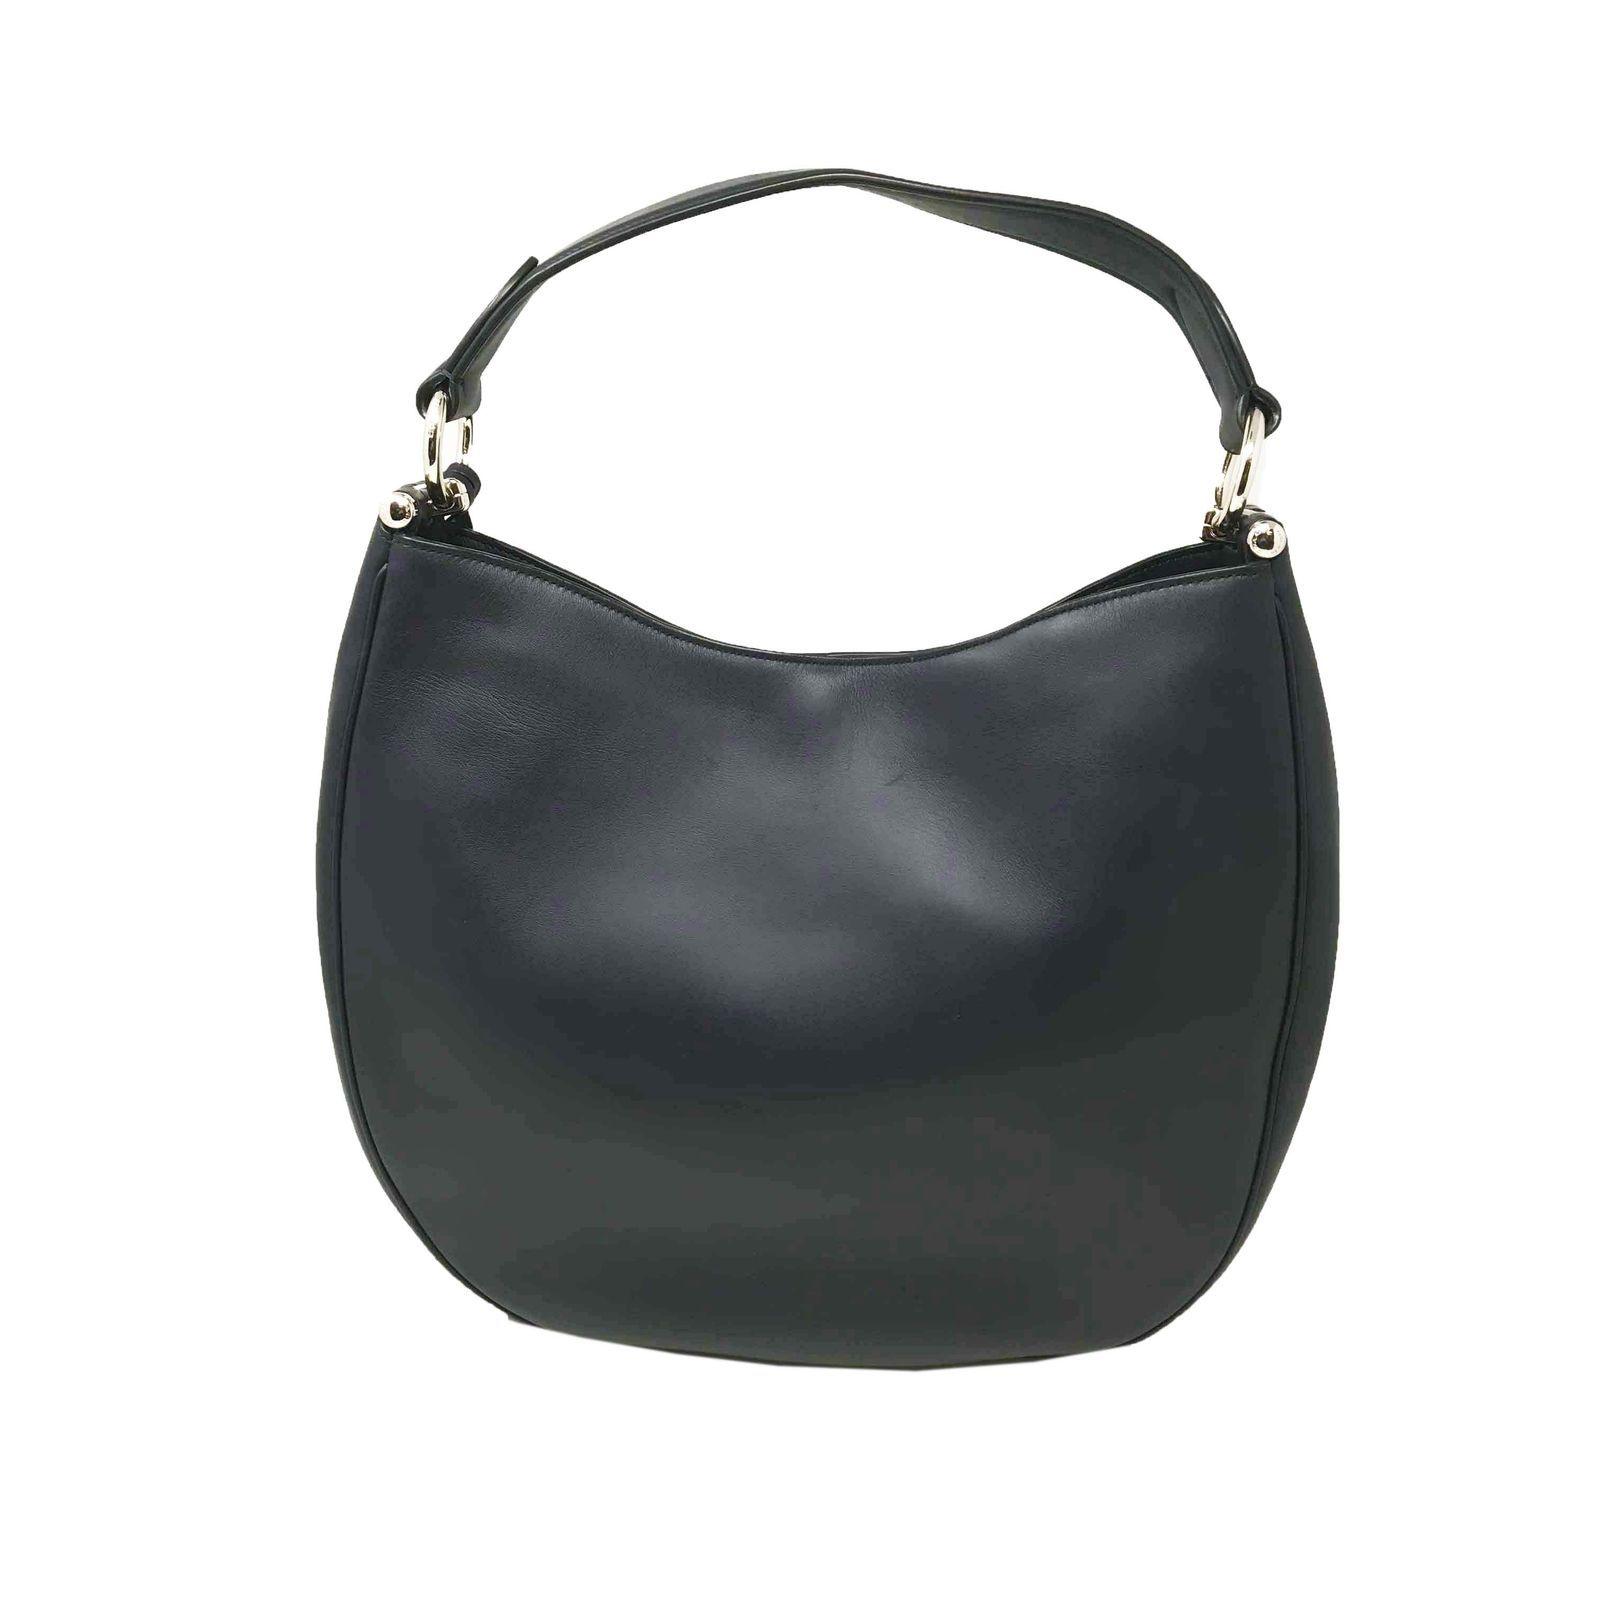 b03f87f1f7 ... Coach 36026 Nomad Hobo In Glovetan Leather Navy Blue Ladies Bag ...